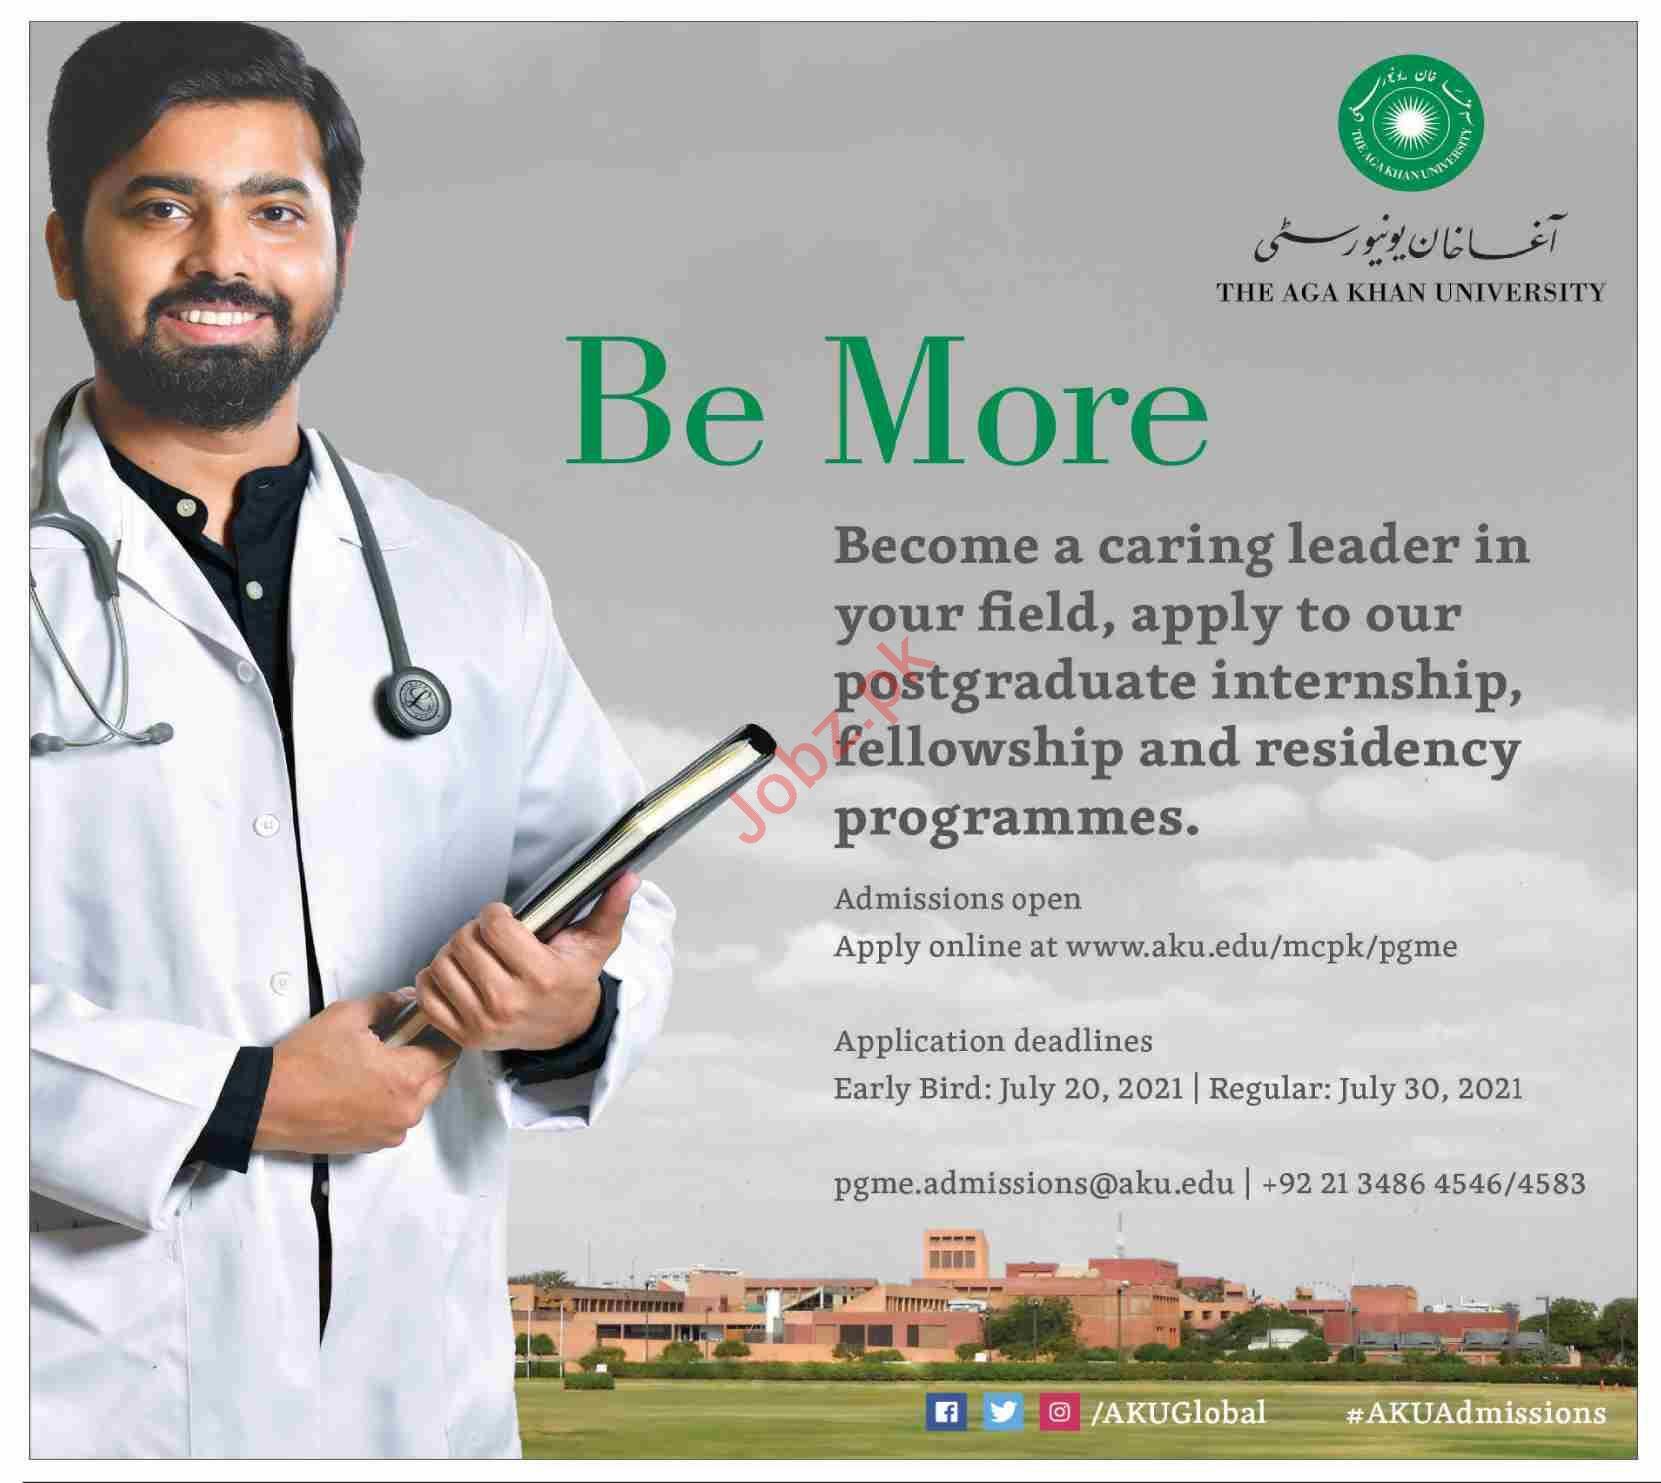 The Aga Khan University AKU Postgraduate Internship 2021